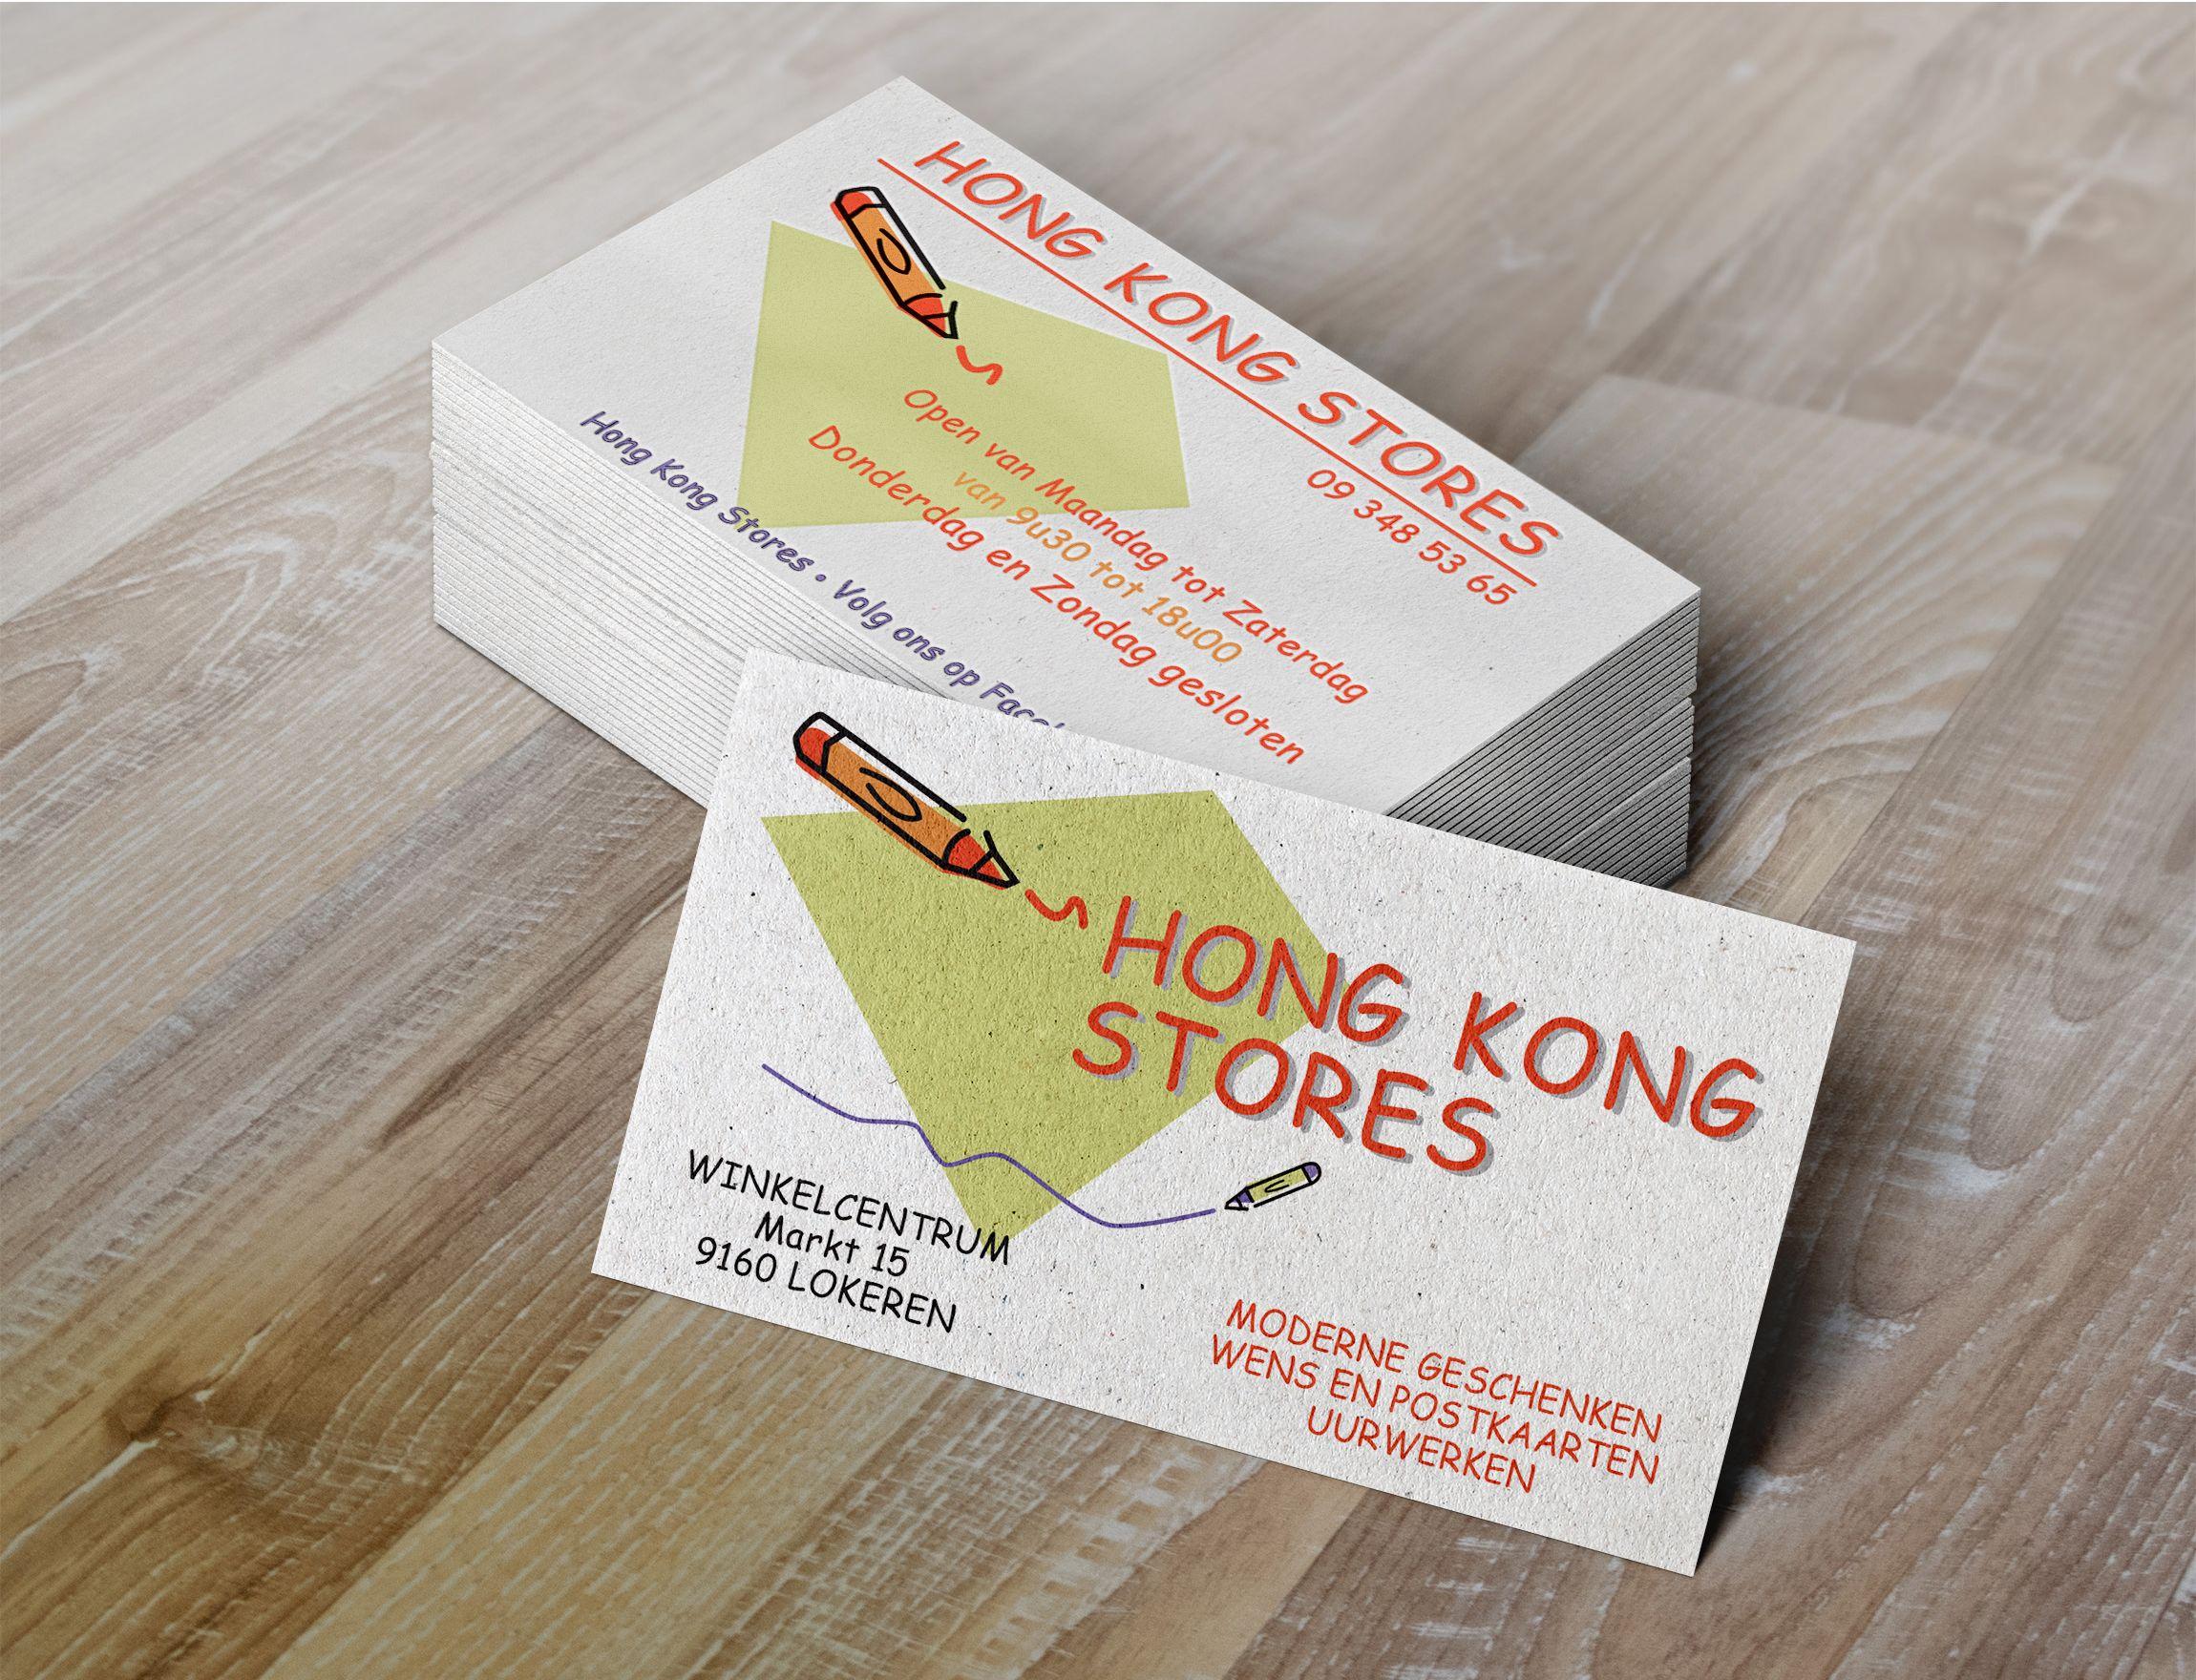 branding business card hong kong stores made by jill caty